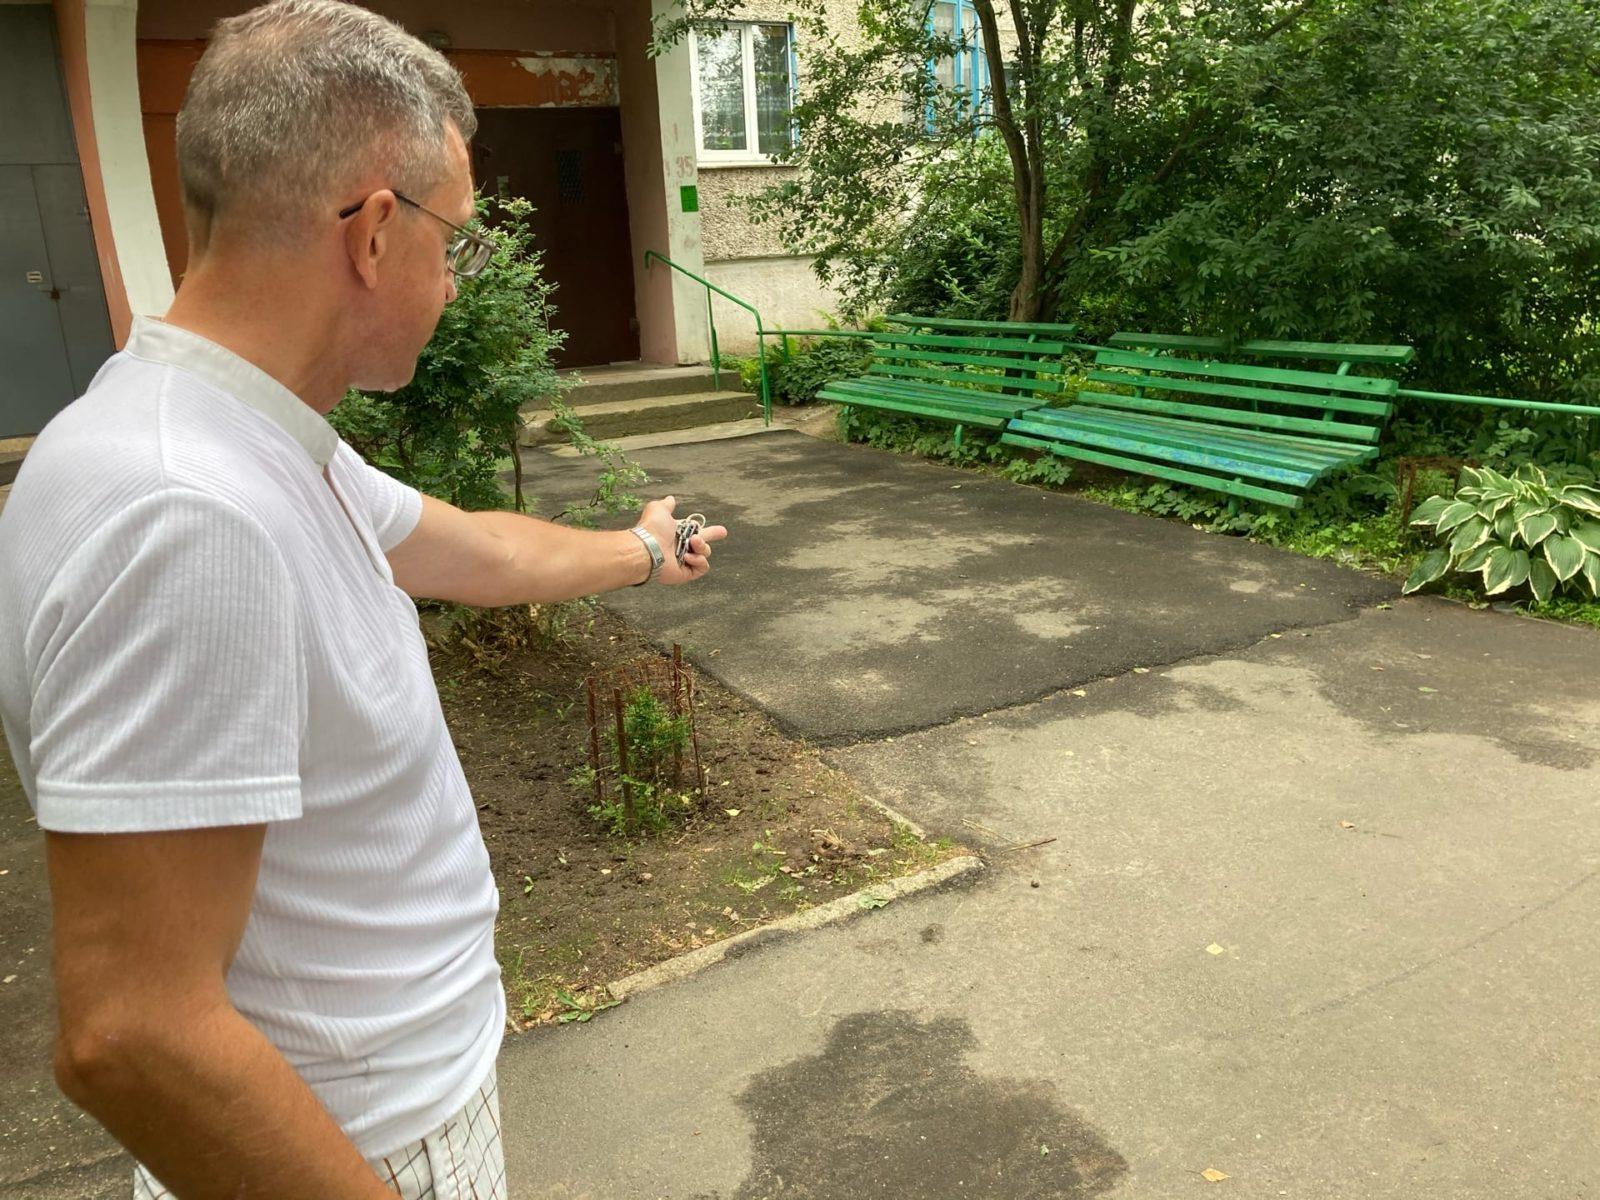 Виталий Белозор возмущен ремонтом дорожки возле своего дома. Фото: Ирина КОМИК